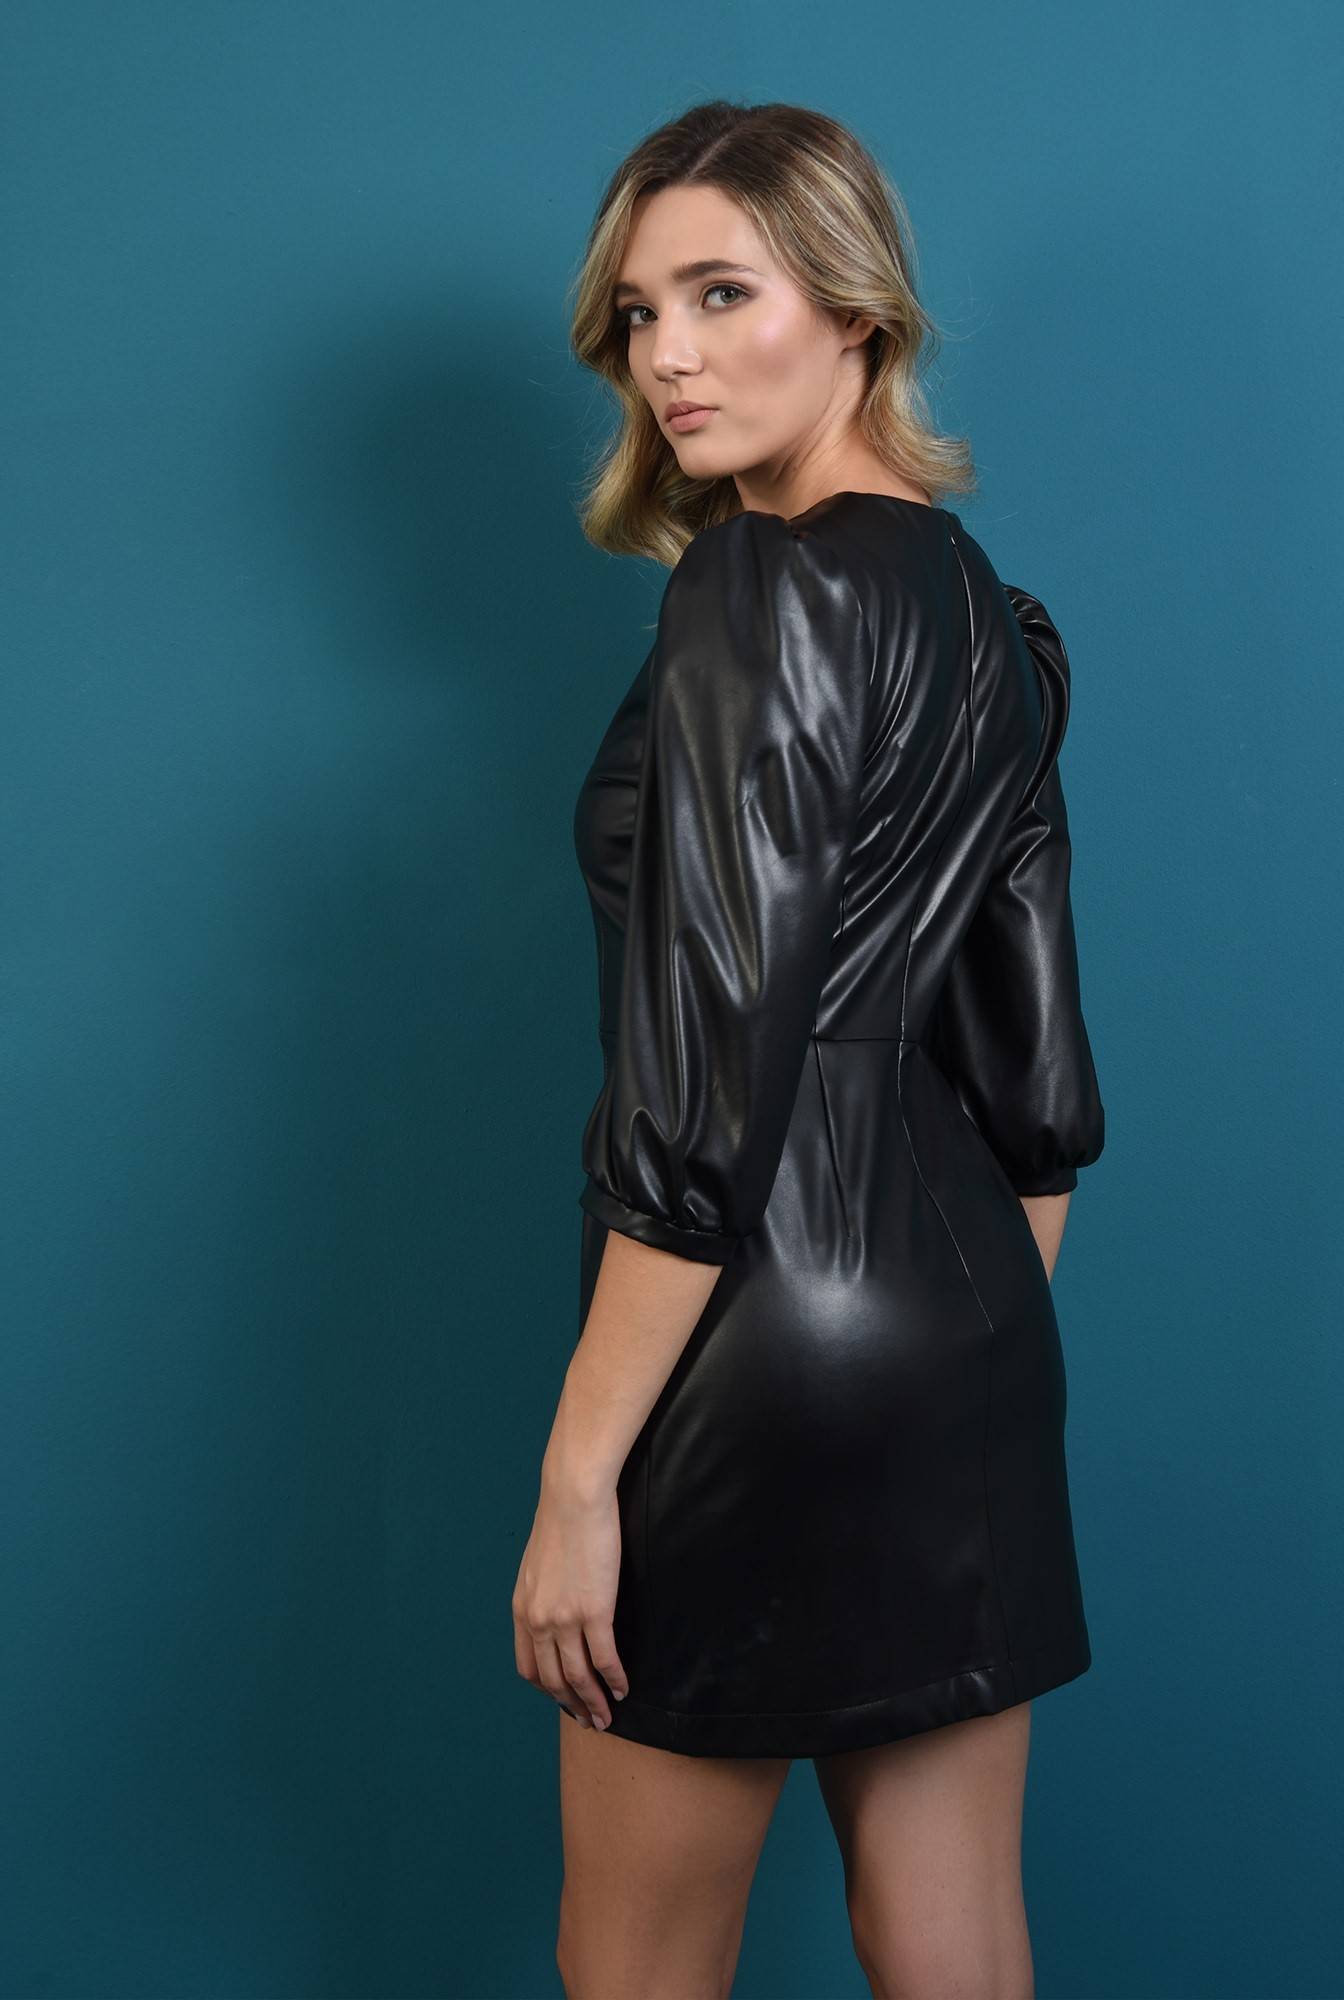 1 - rochie neagra scurta, din piele eco, cu maneca bufanta